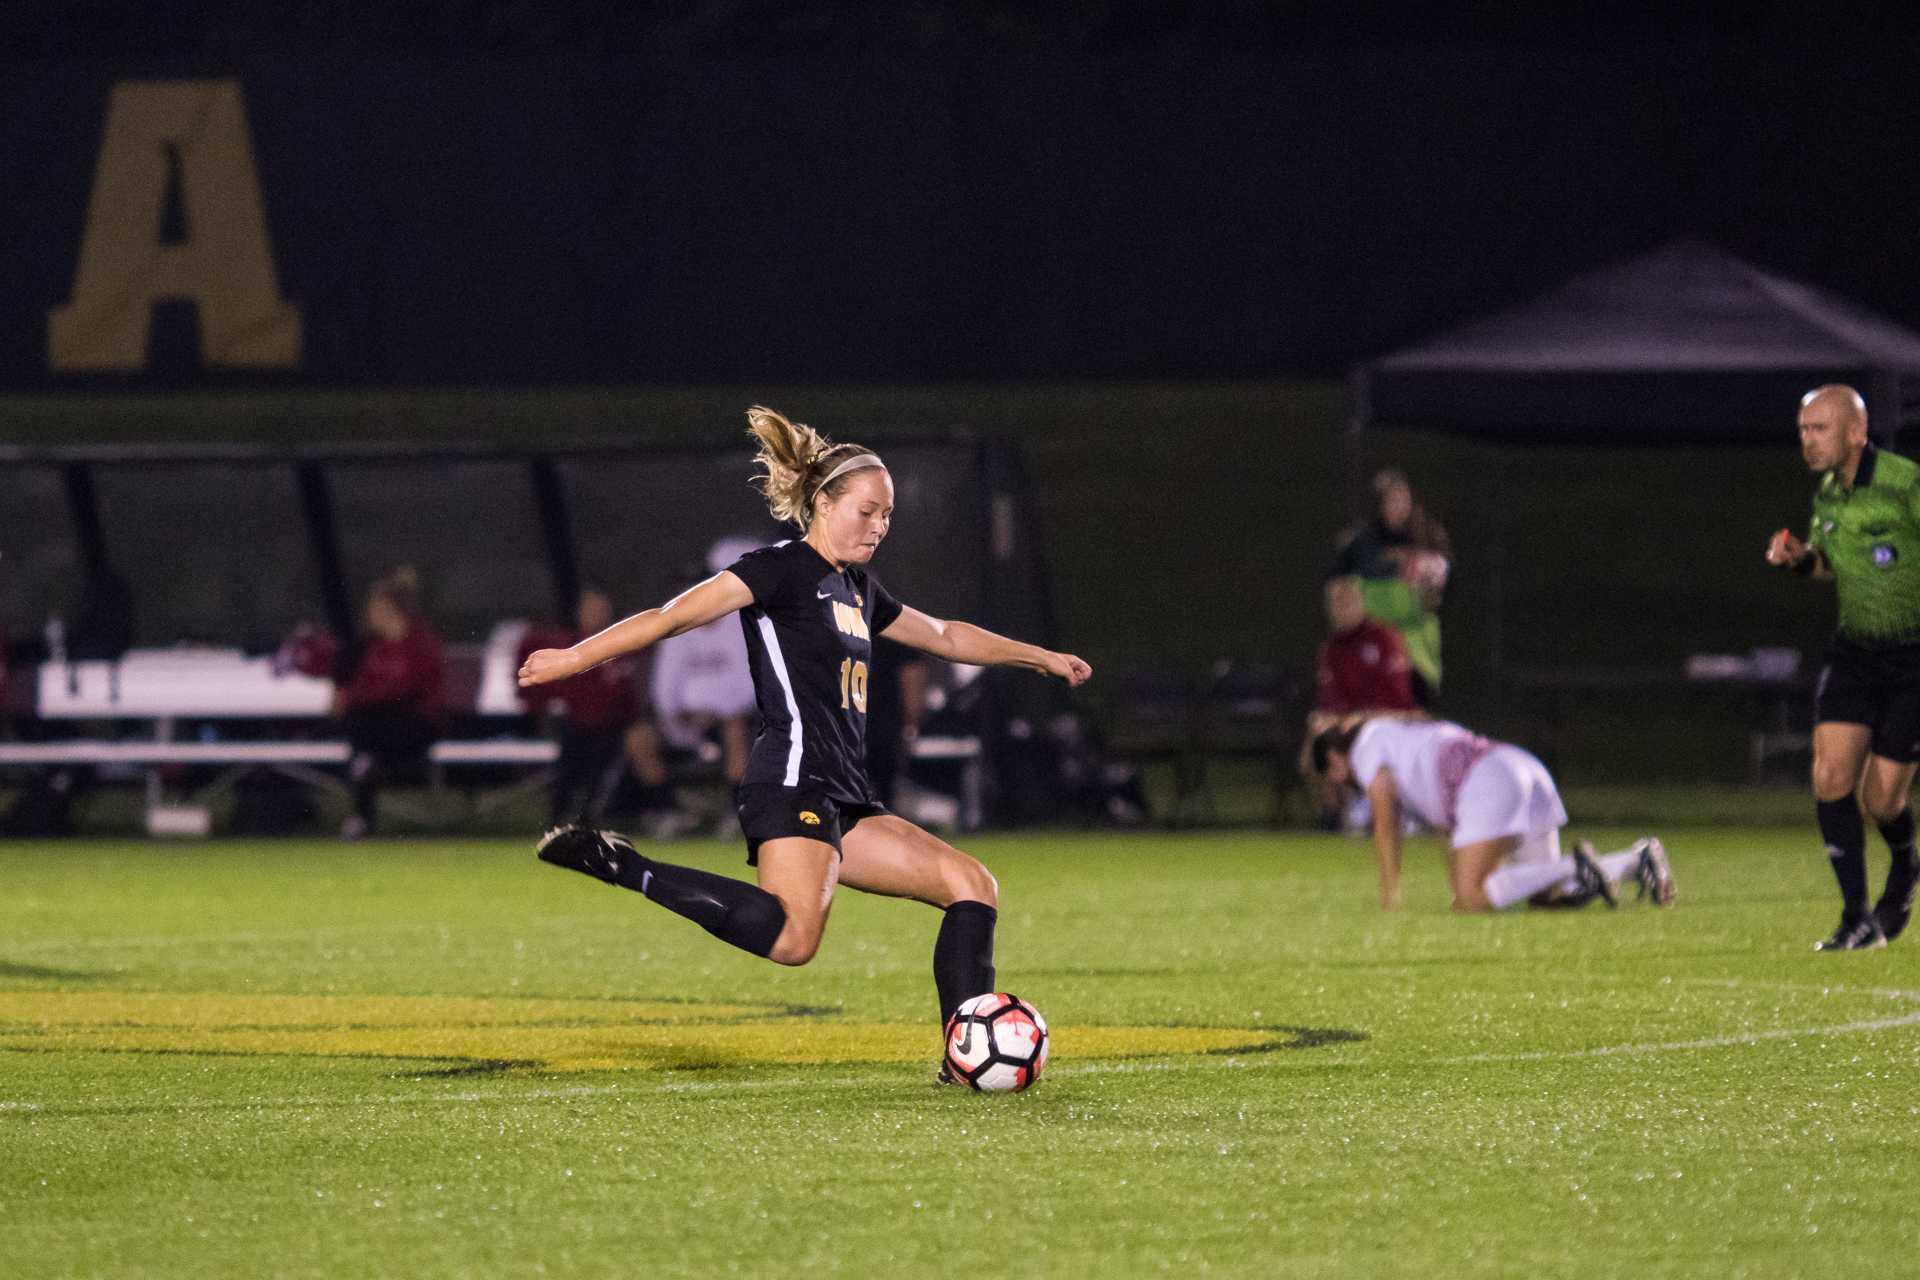 Iowa's Natalie Winters kicks the ball during the Iowa/Rutgers soccer game on Thursday, Oct. 5, 2017. Iowa won the match 1-0. (David Harmantas/The Daily Iowan)